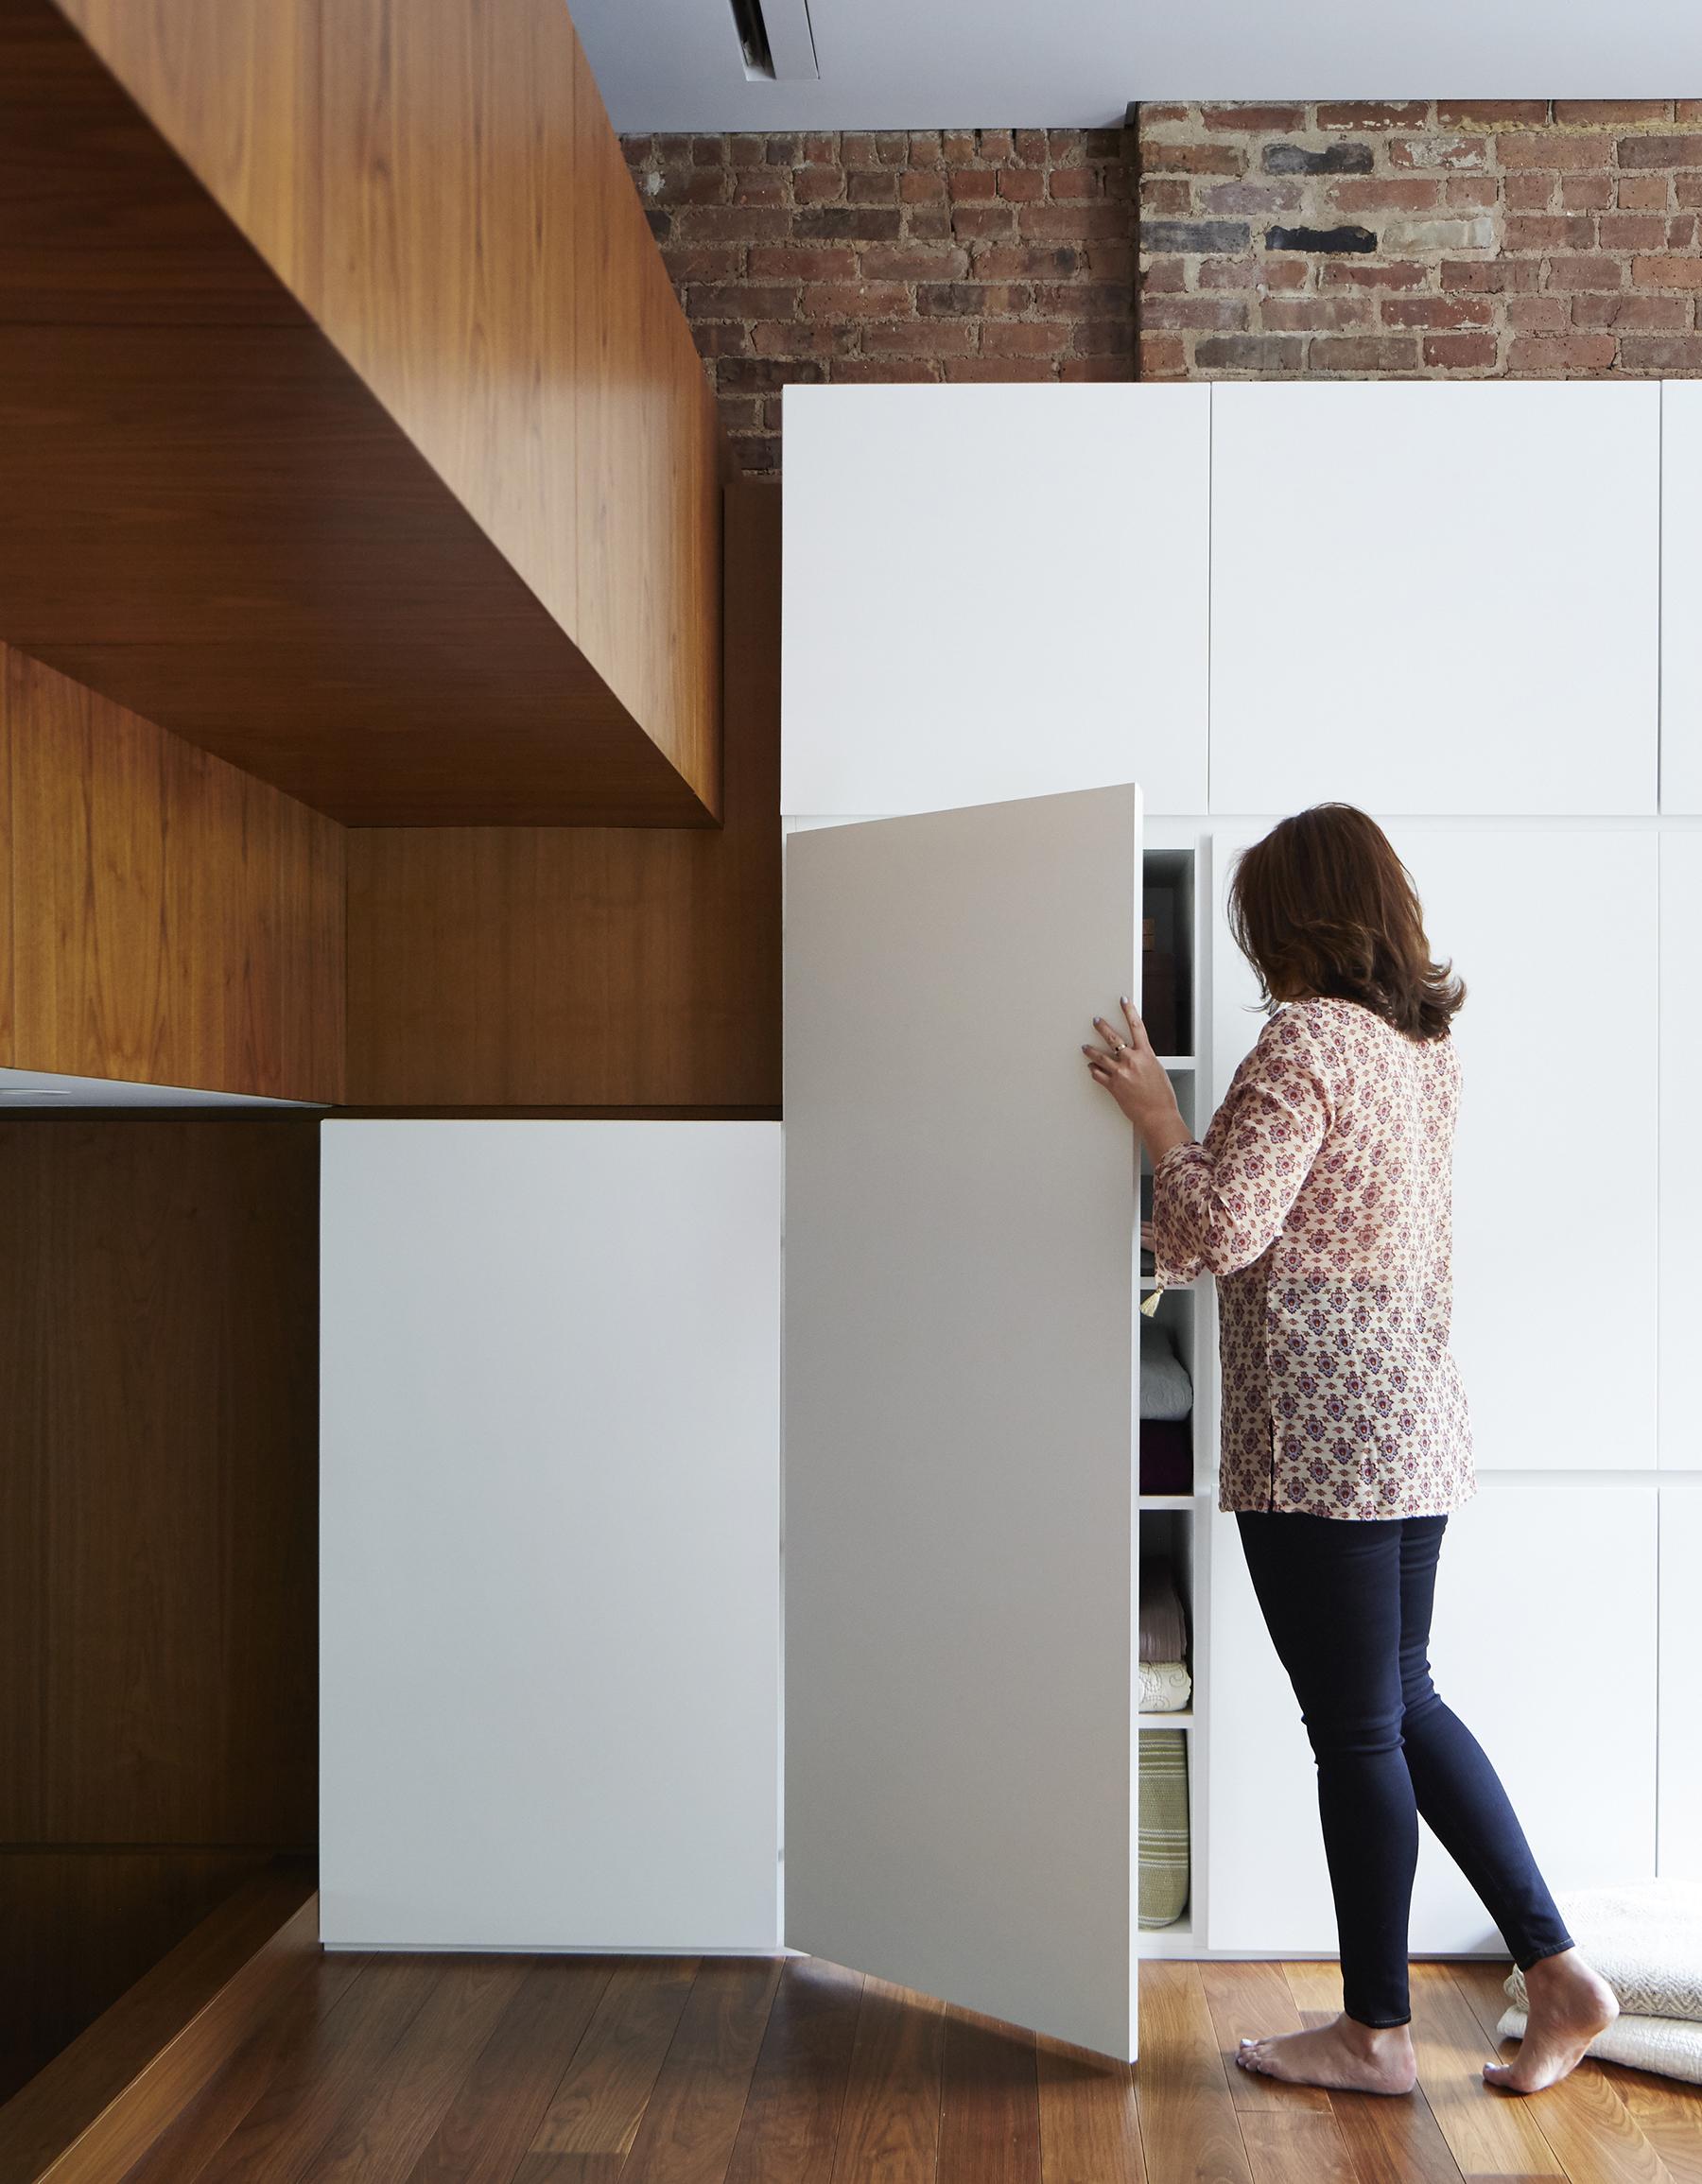 STADT Architecture, Loft, custom cabinets, walnut, STADT, nyc architects, ny apartment renovation